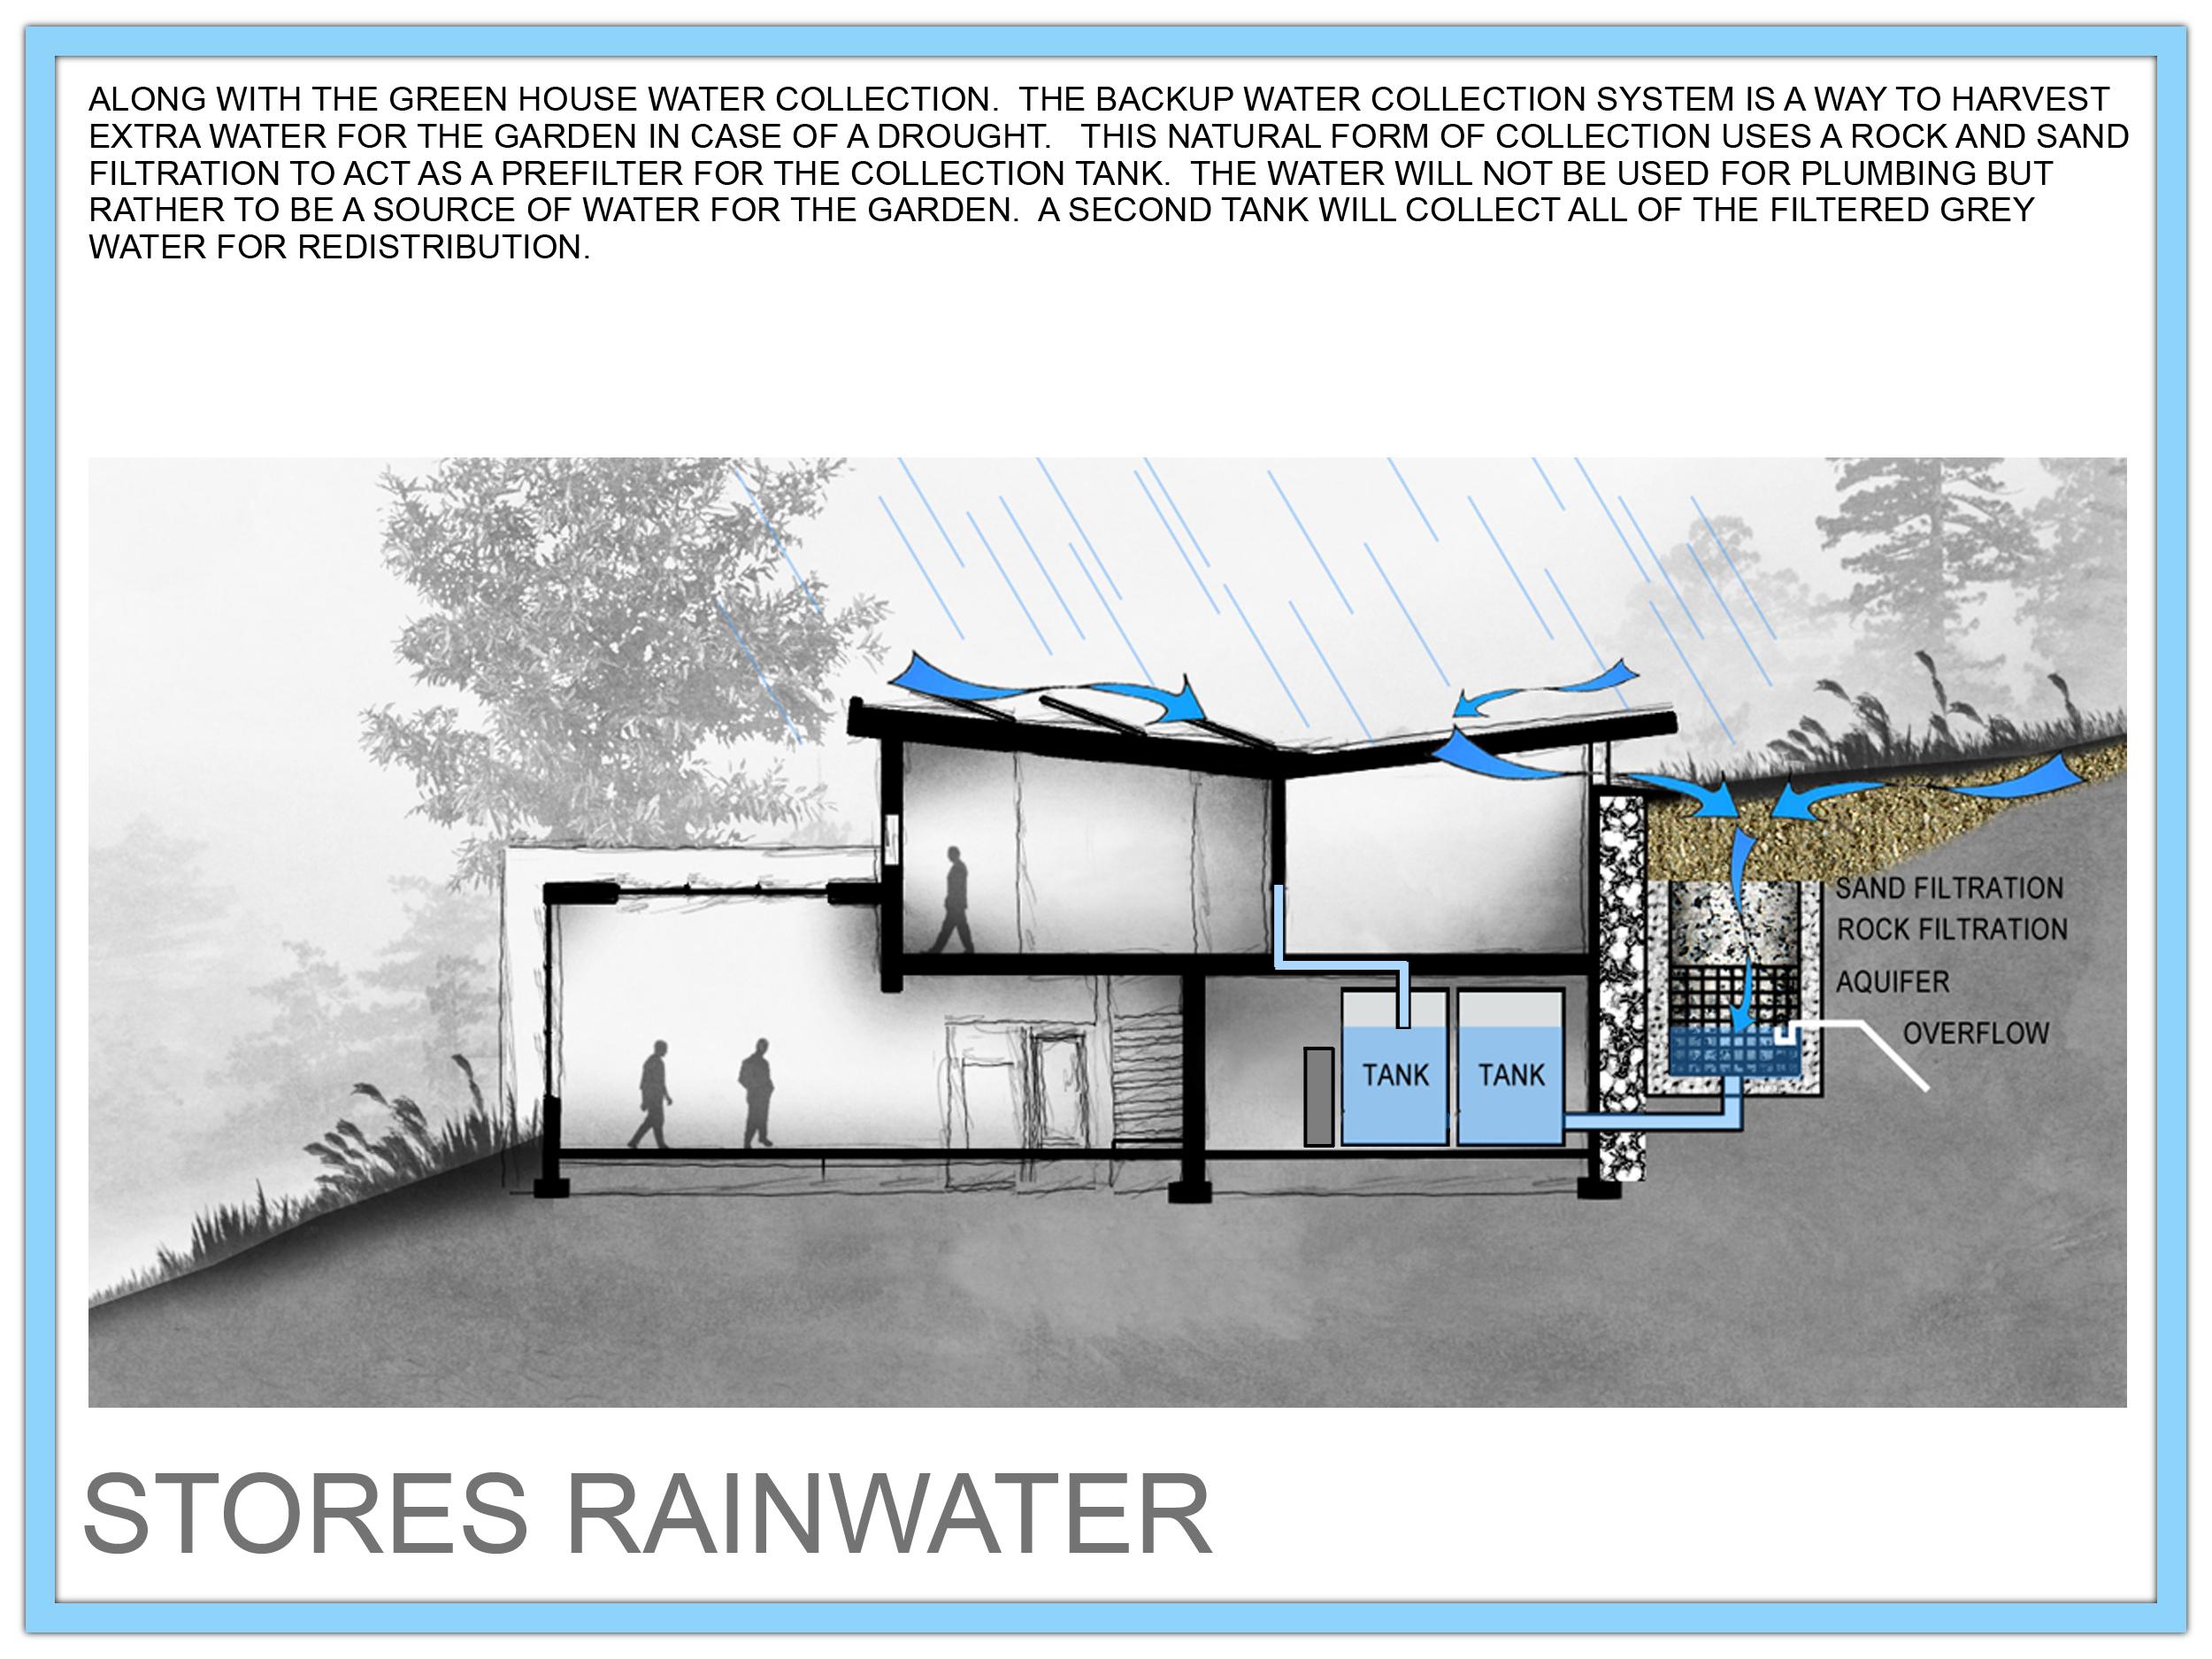 StoresRainwater.jpg